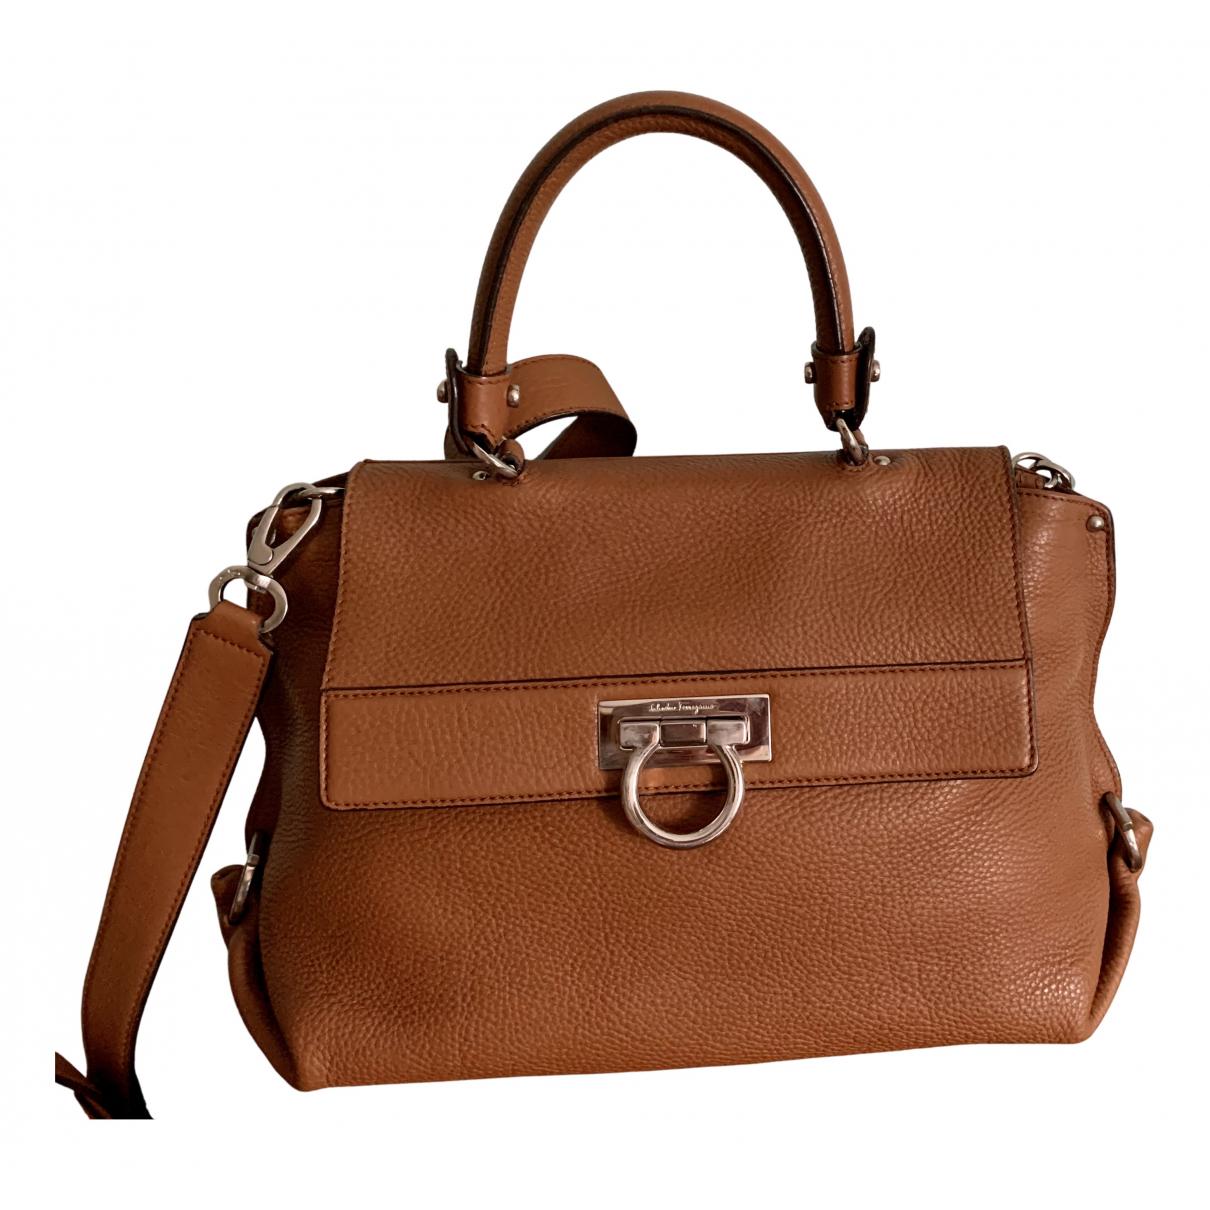 Salvatore Ferragamo Sofia Camel Leather handbag for Women N